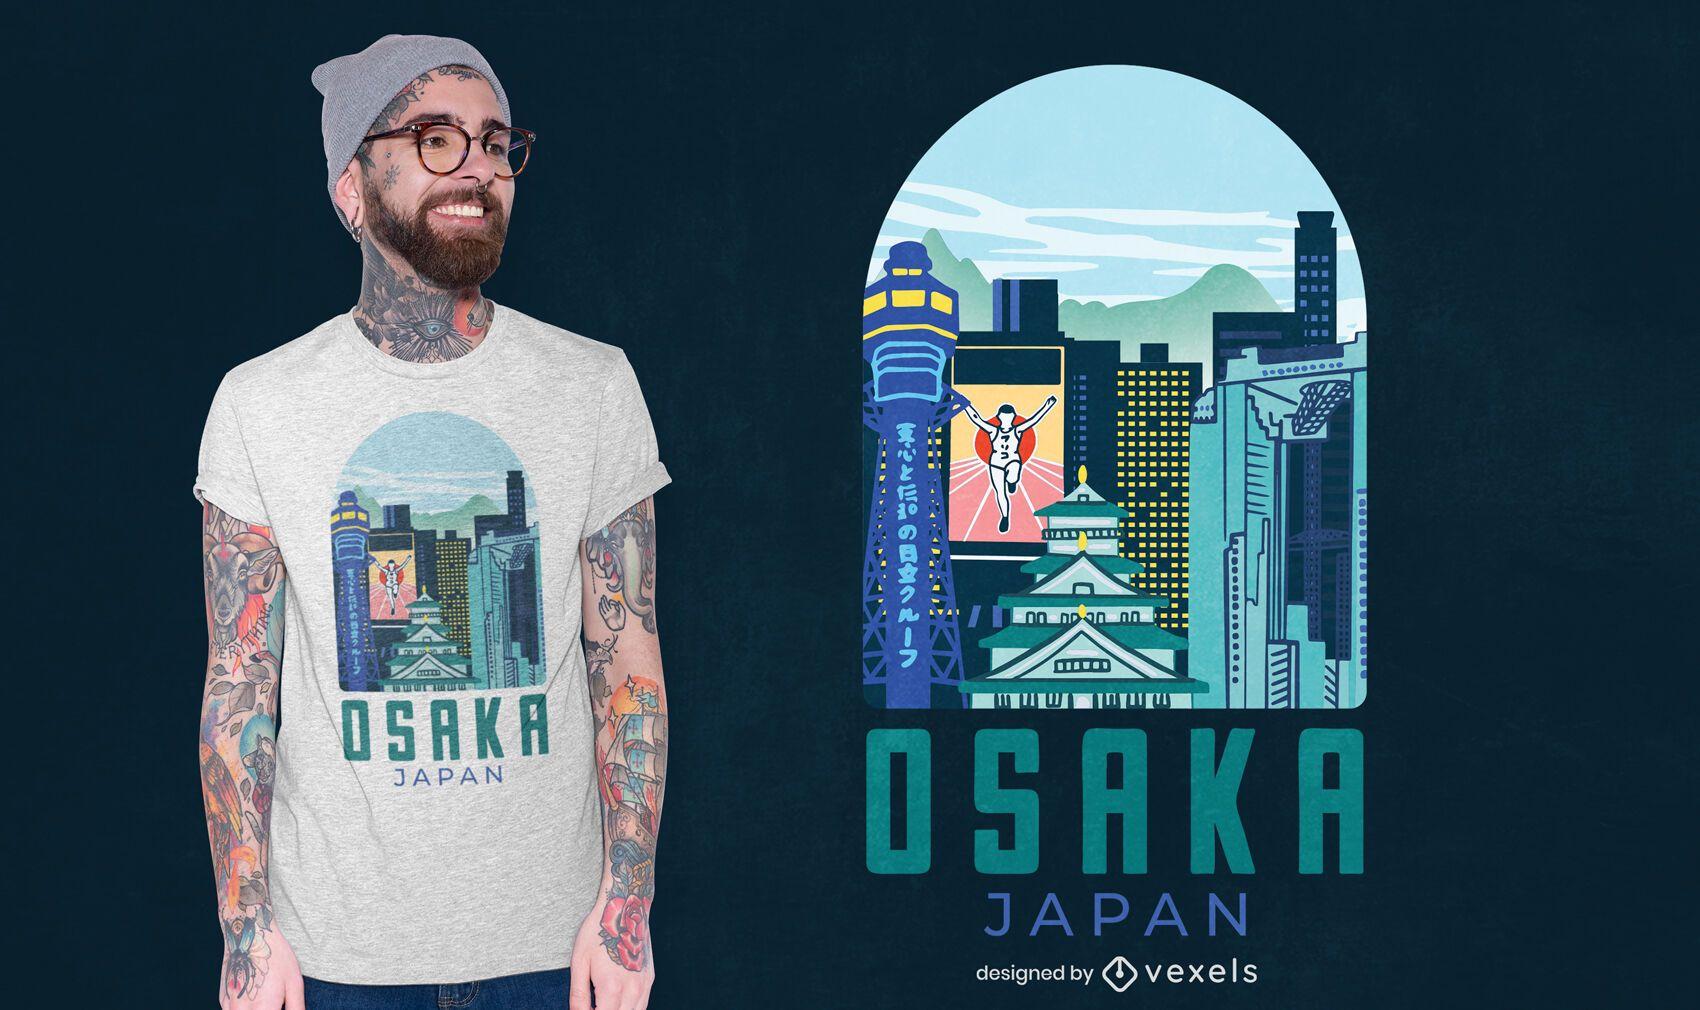 Osaka city t-shirt design